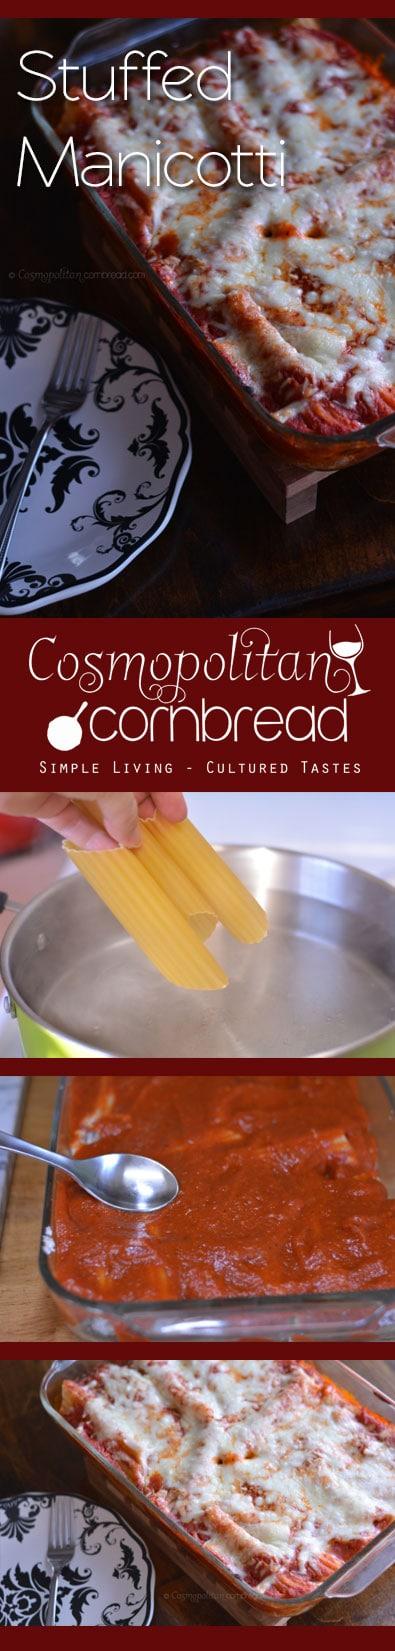 How to make delicious and classic Stuffed Manicotti, from Cosmopolitan Cornbread